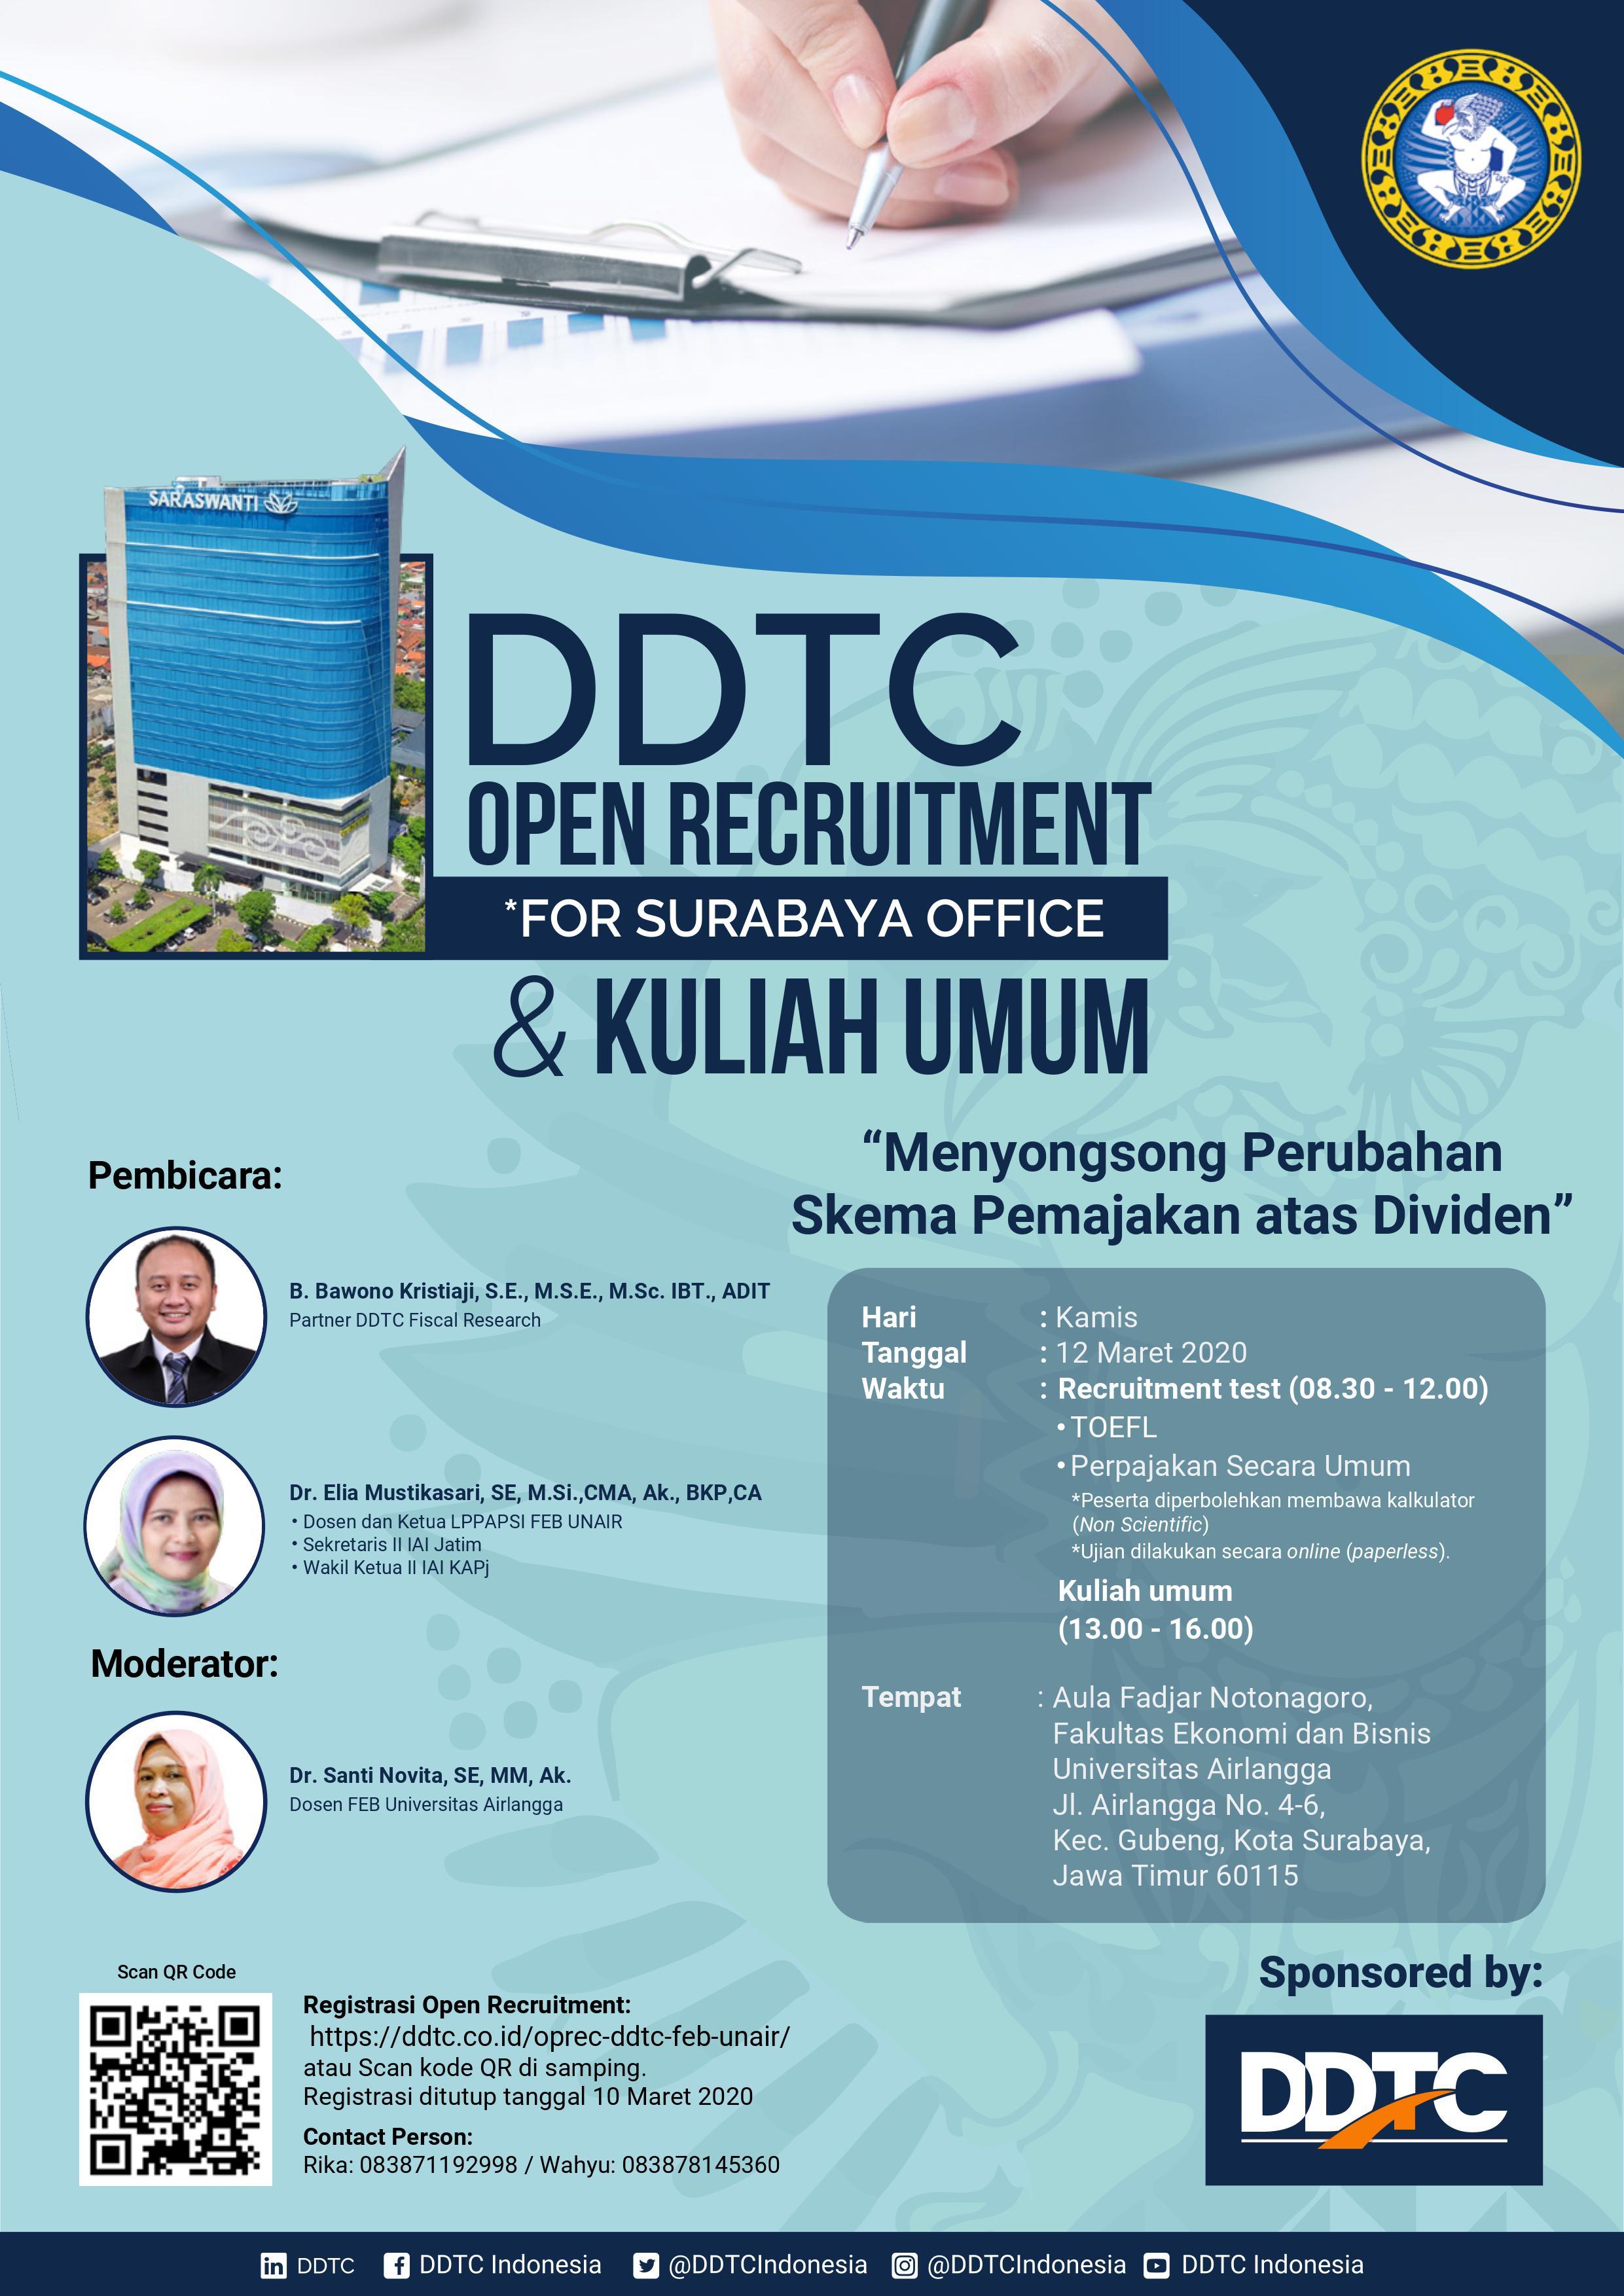 Open Recruitment DDTC & Kuliah Umum Soal Pajak Dividen di UNAIR, Mau?